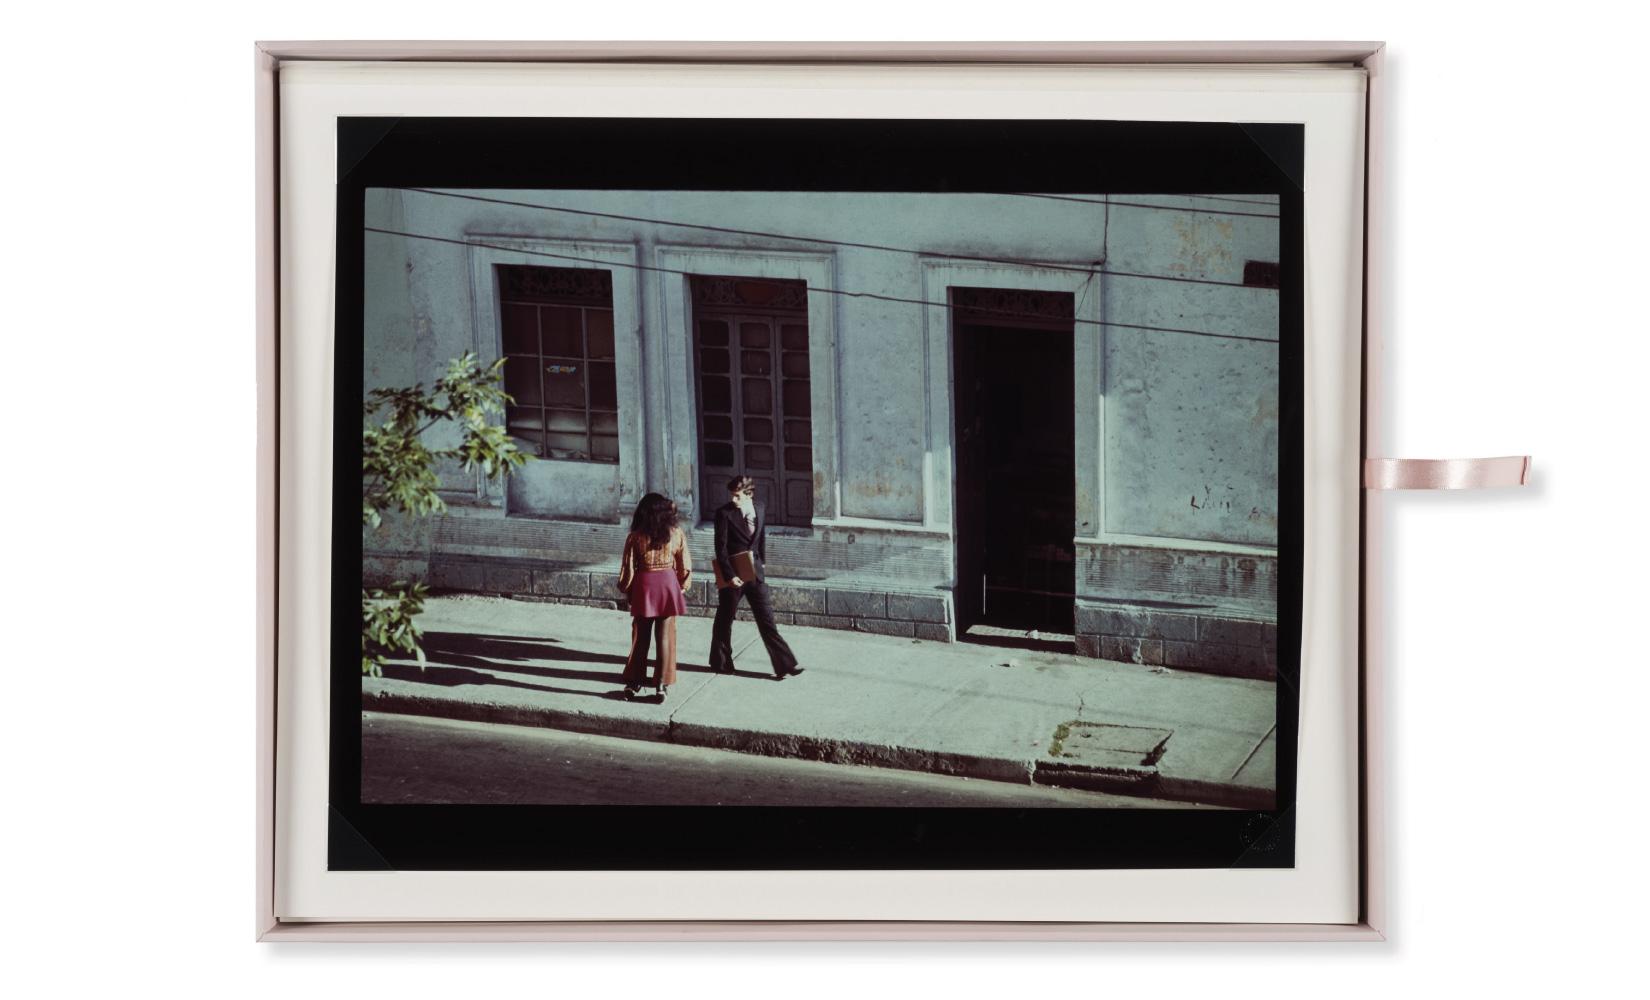 esquina-rose-rojas-toluca-studio-olivier-andreotti-09.jpg